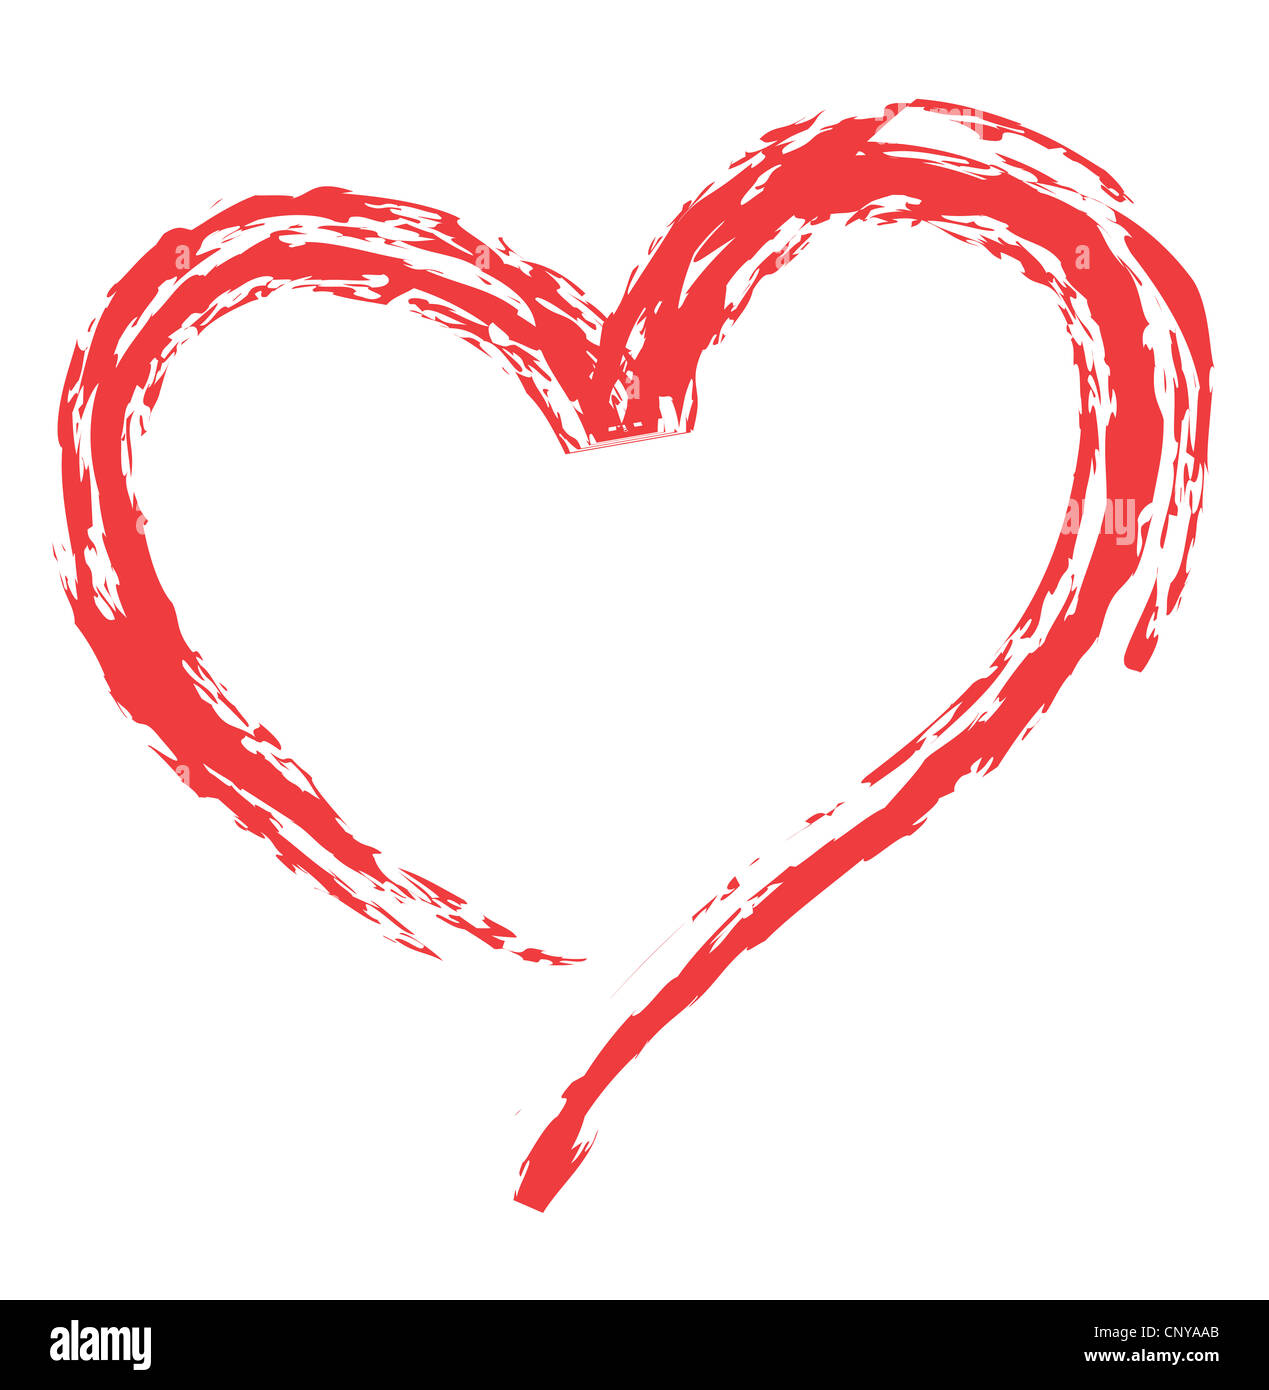 Heart shape design for love symbols stock photo royalty free heart shape design for love symbols biocorpaavc